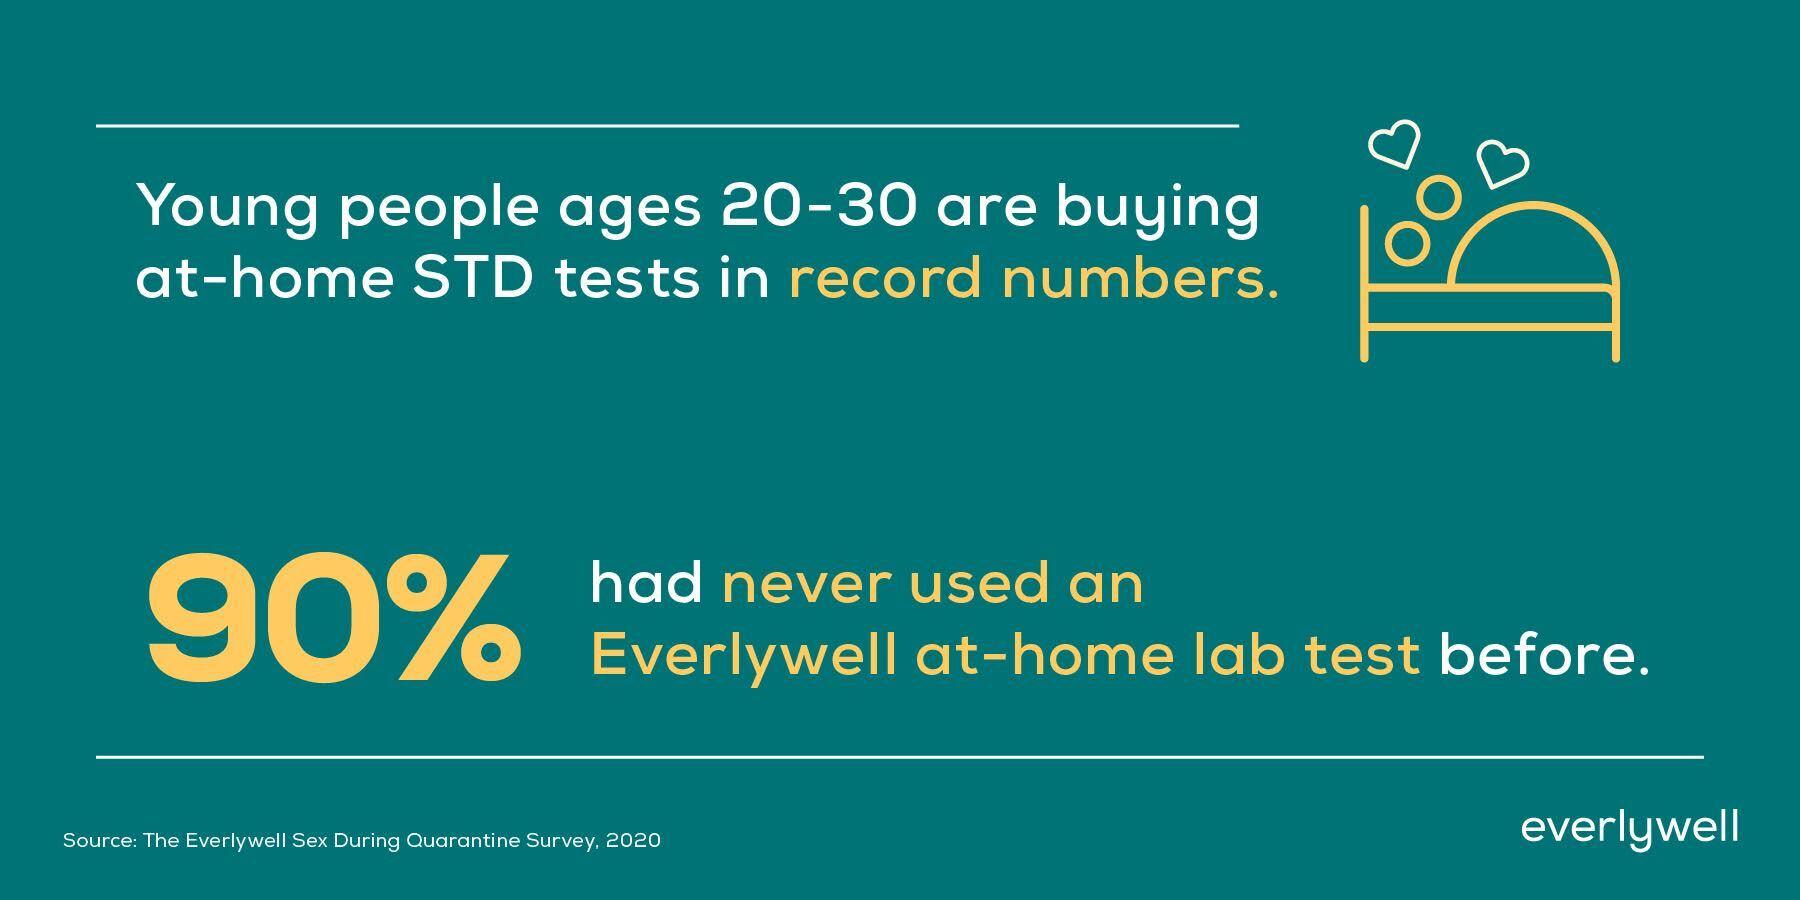 At-home lab testing during quarantine